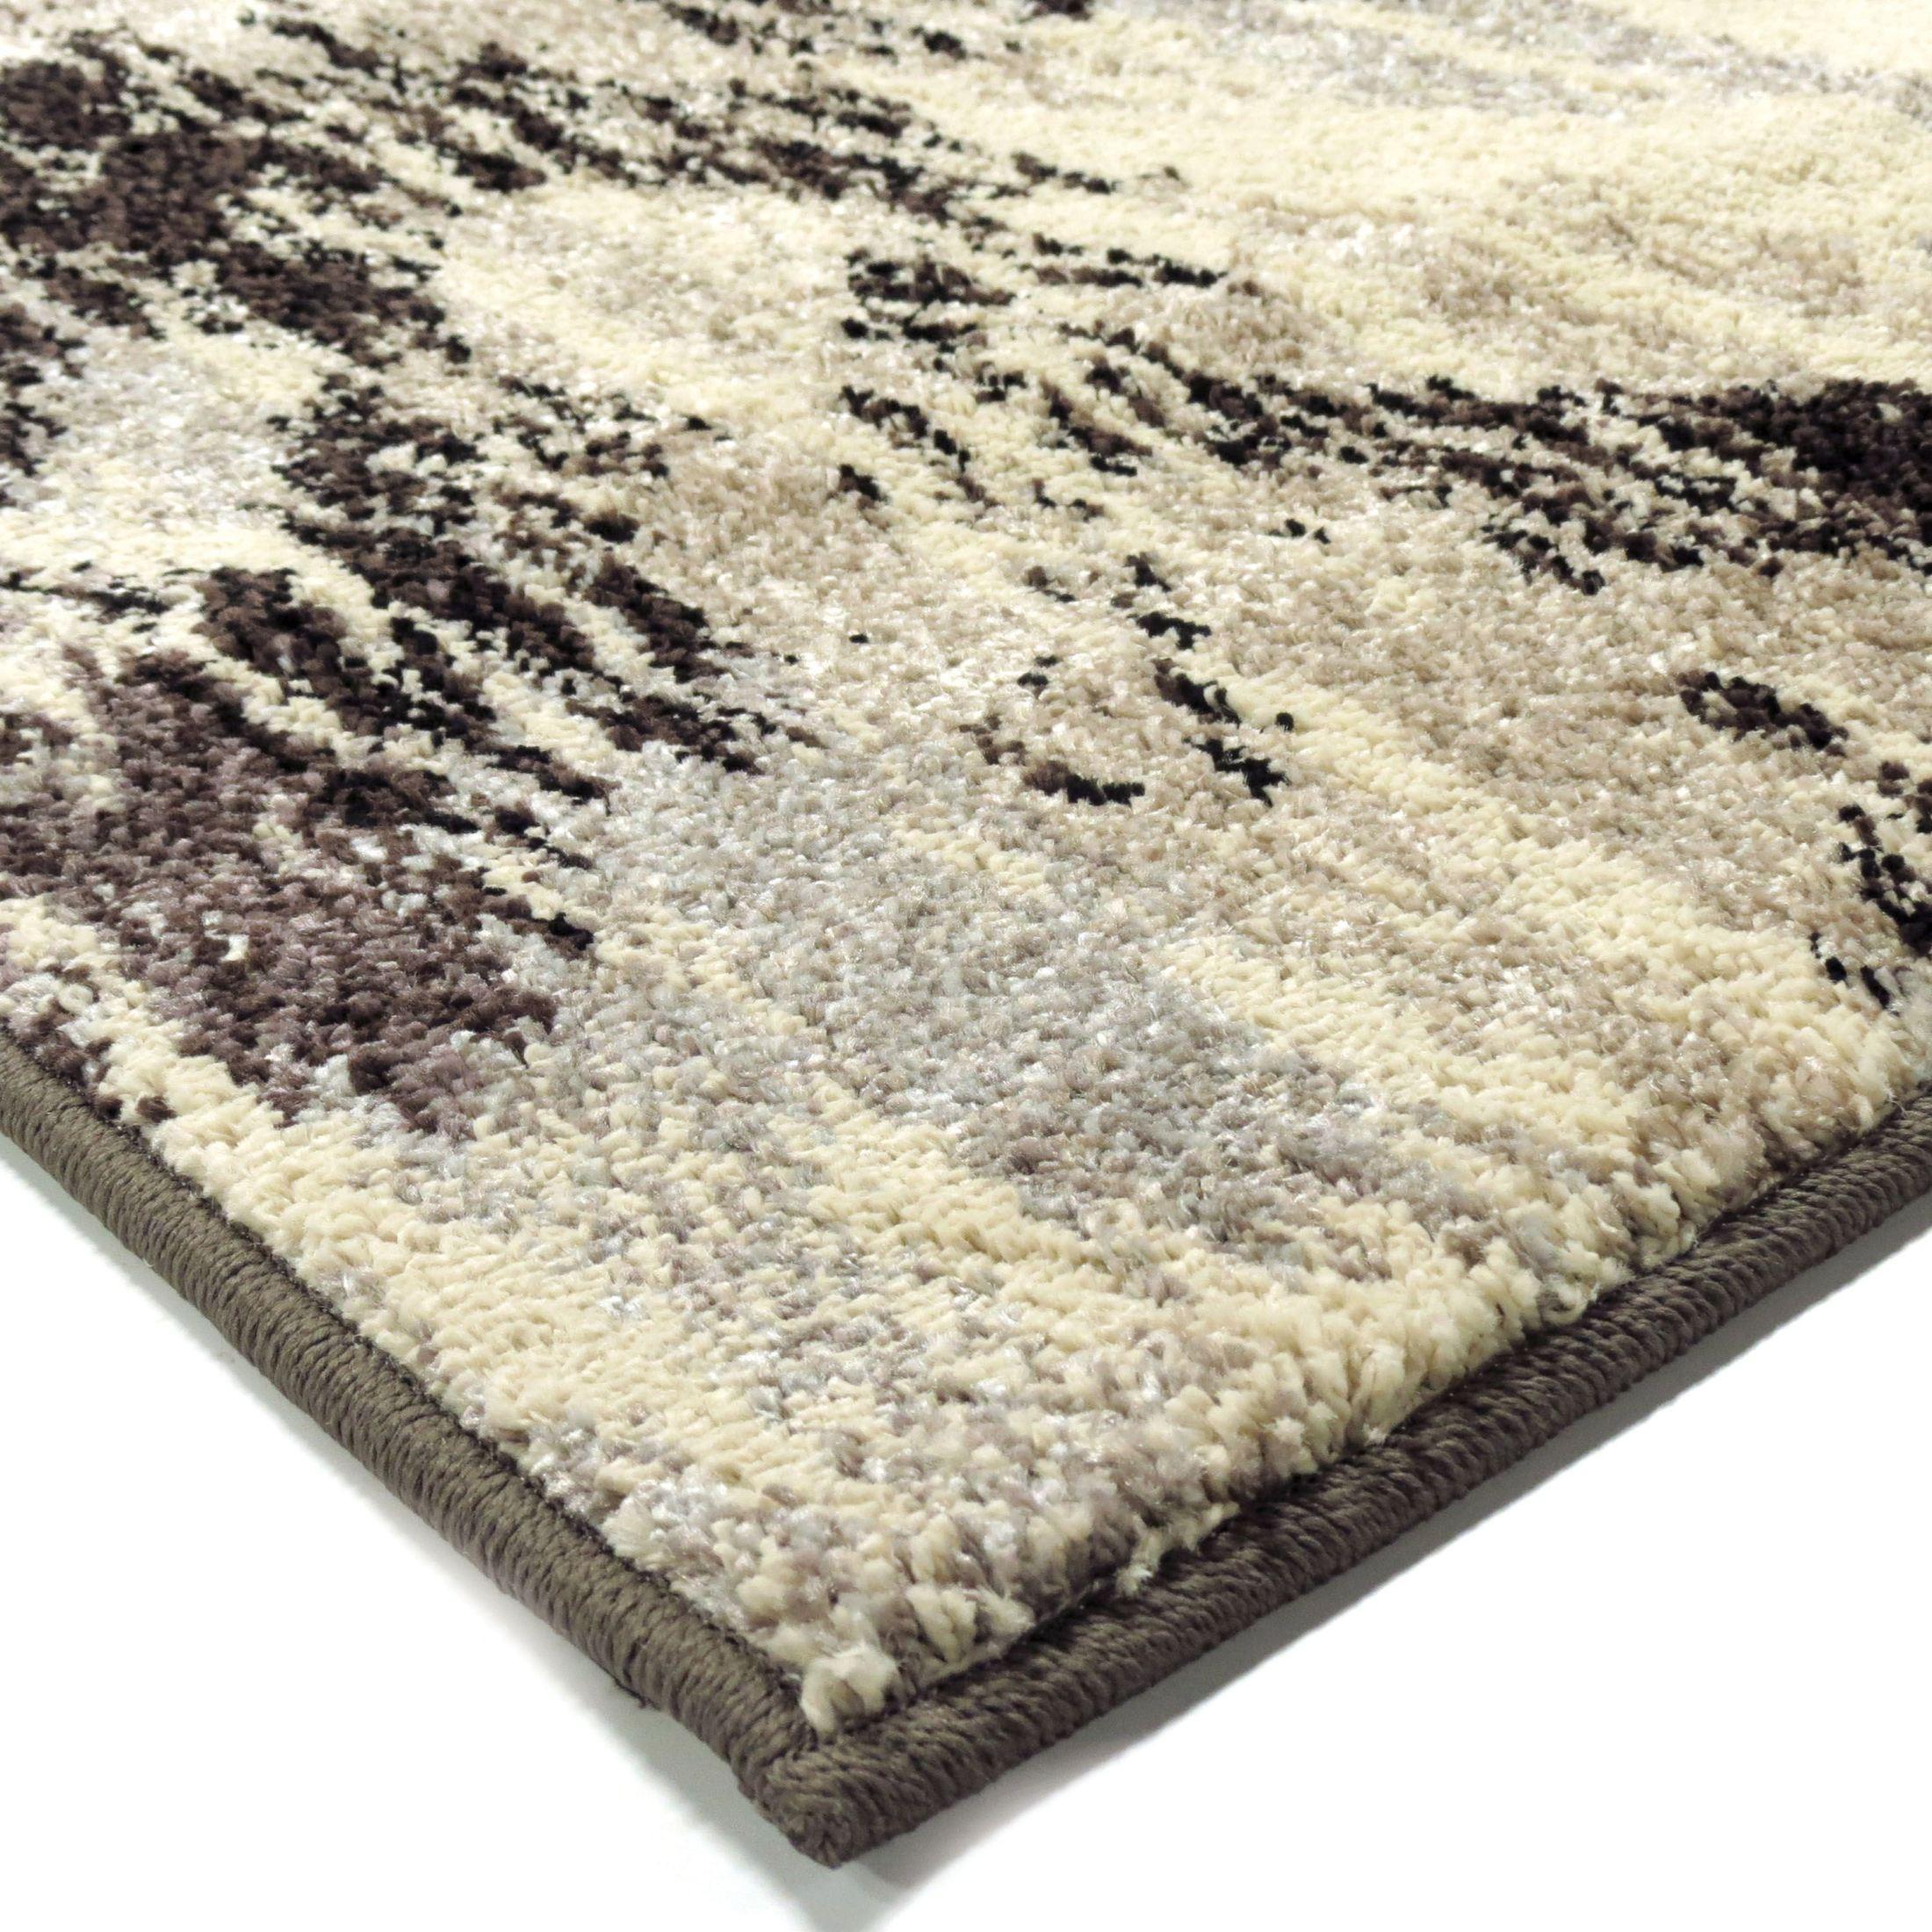 Gray Area Rug 8x11: Orian Rugs Plush Pile Chevron Distressed Chevron Gray Area